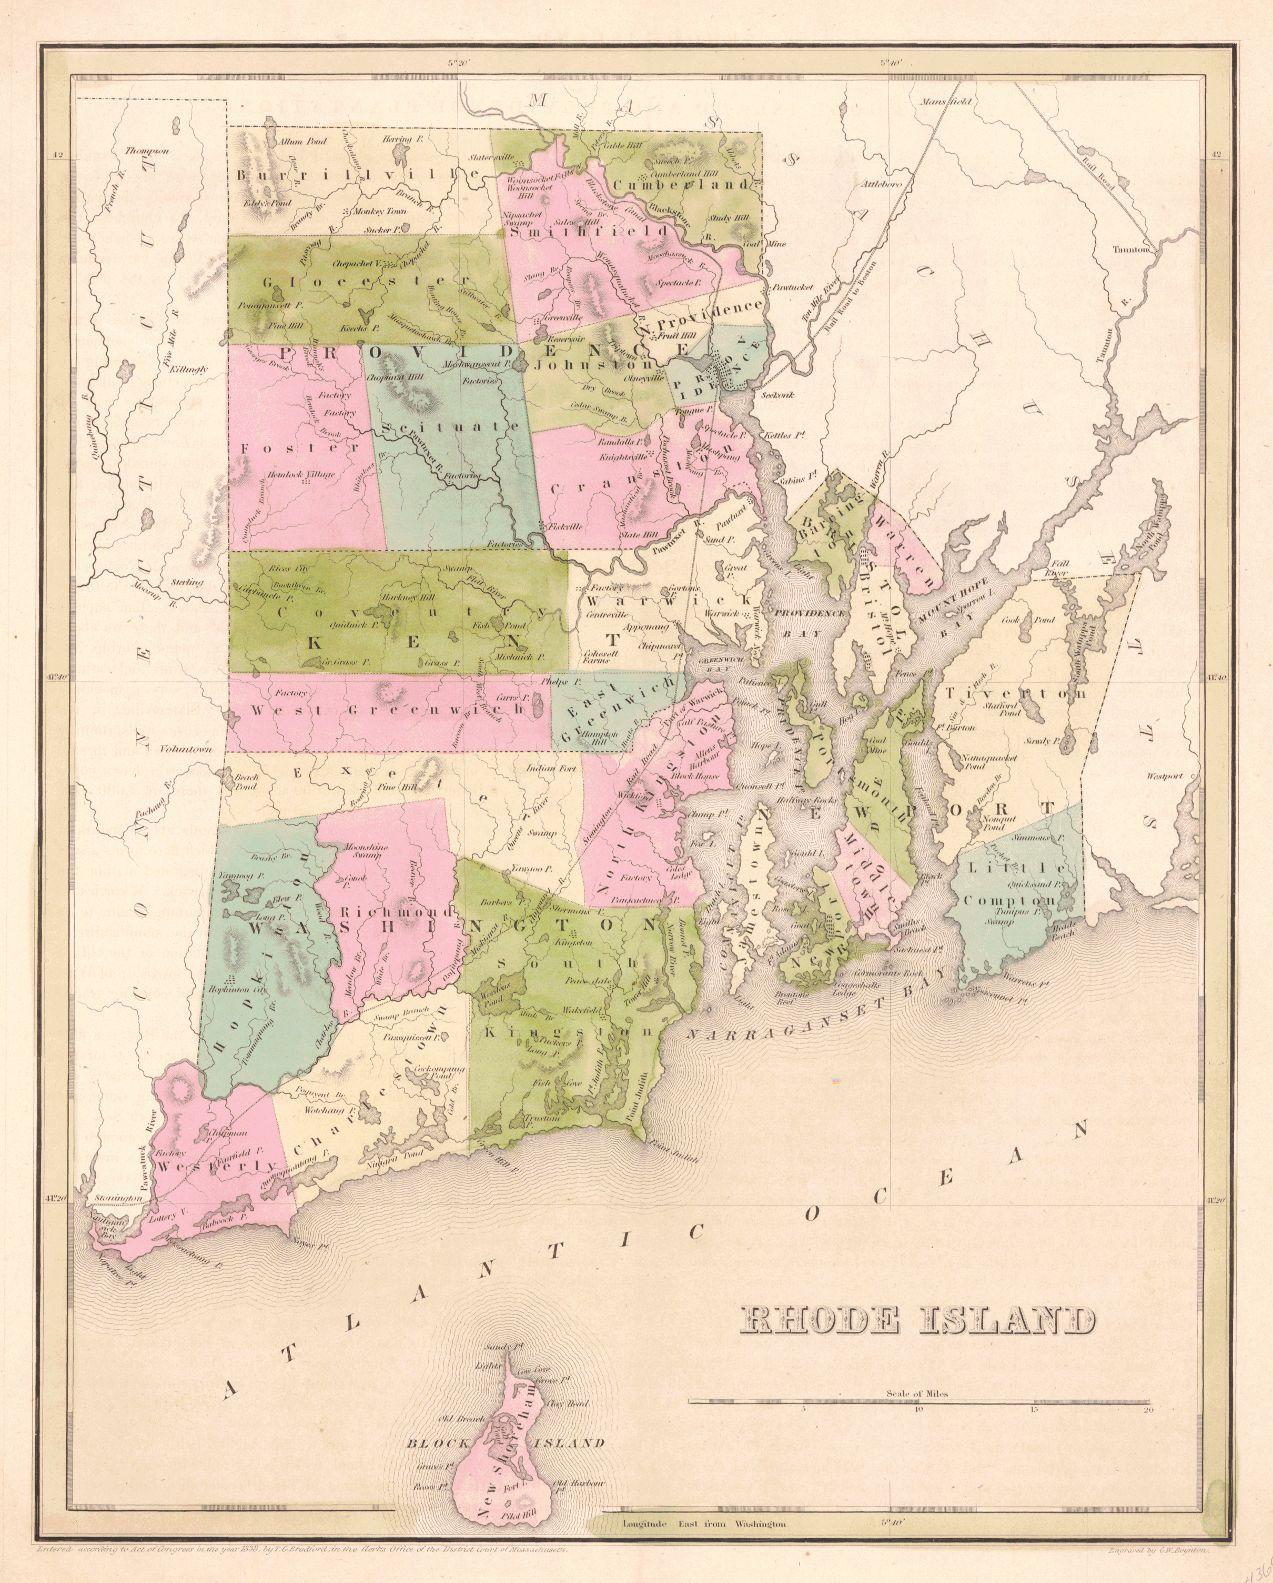 Rhode Island Strong Charles D Bradford TBGoodrich SG 1841